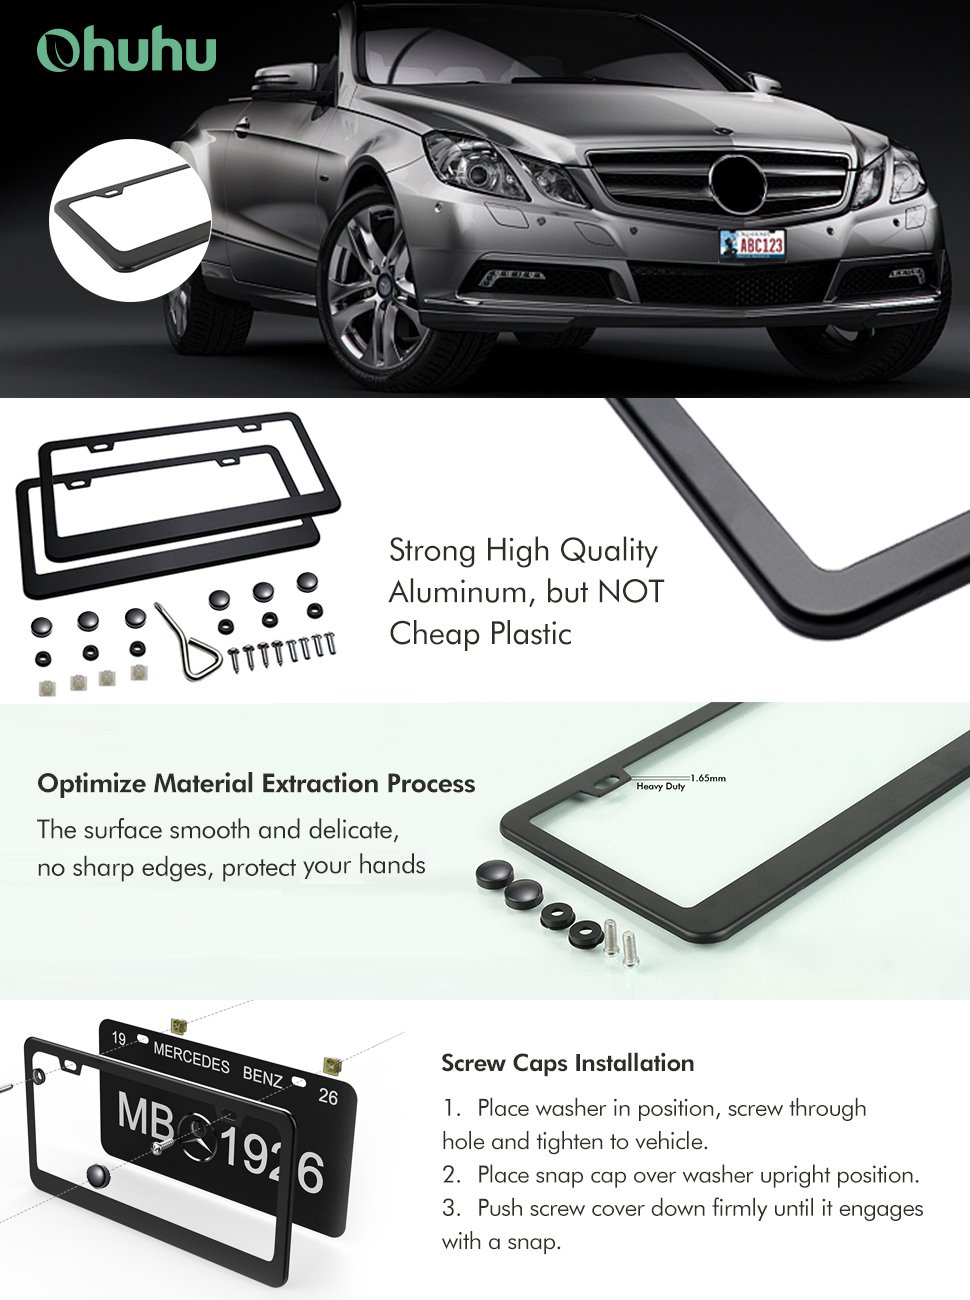 Amazon.com: Ohuhu Matte Aluminum License Plate Frame with Black ...